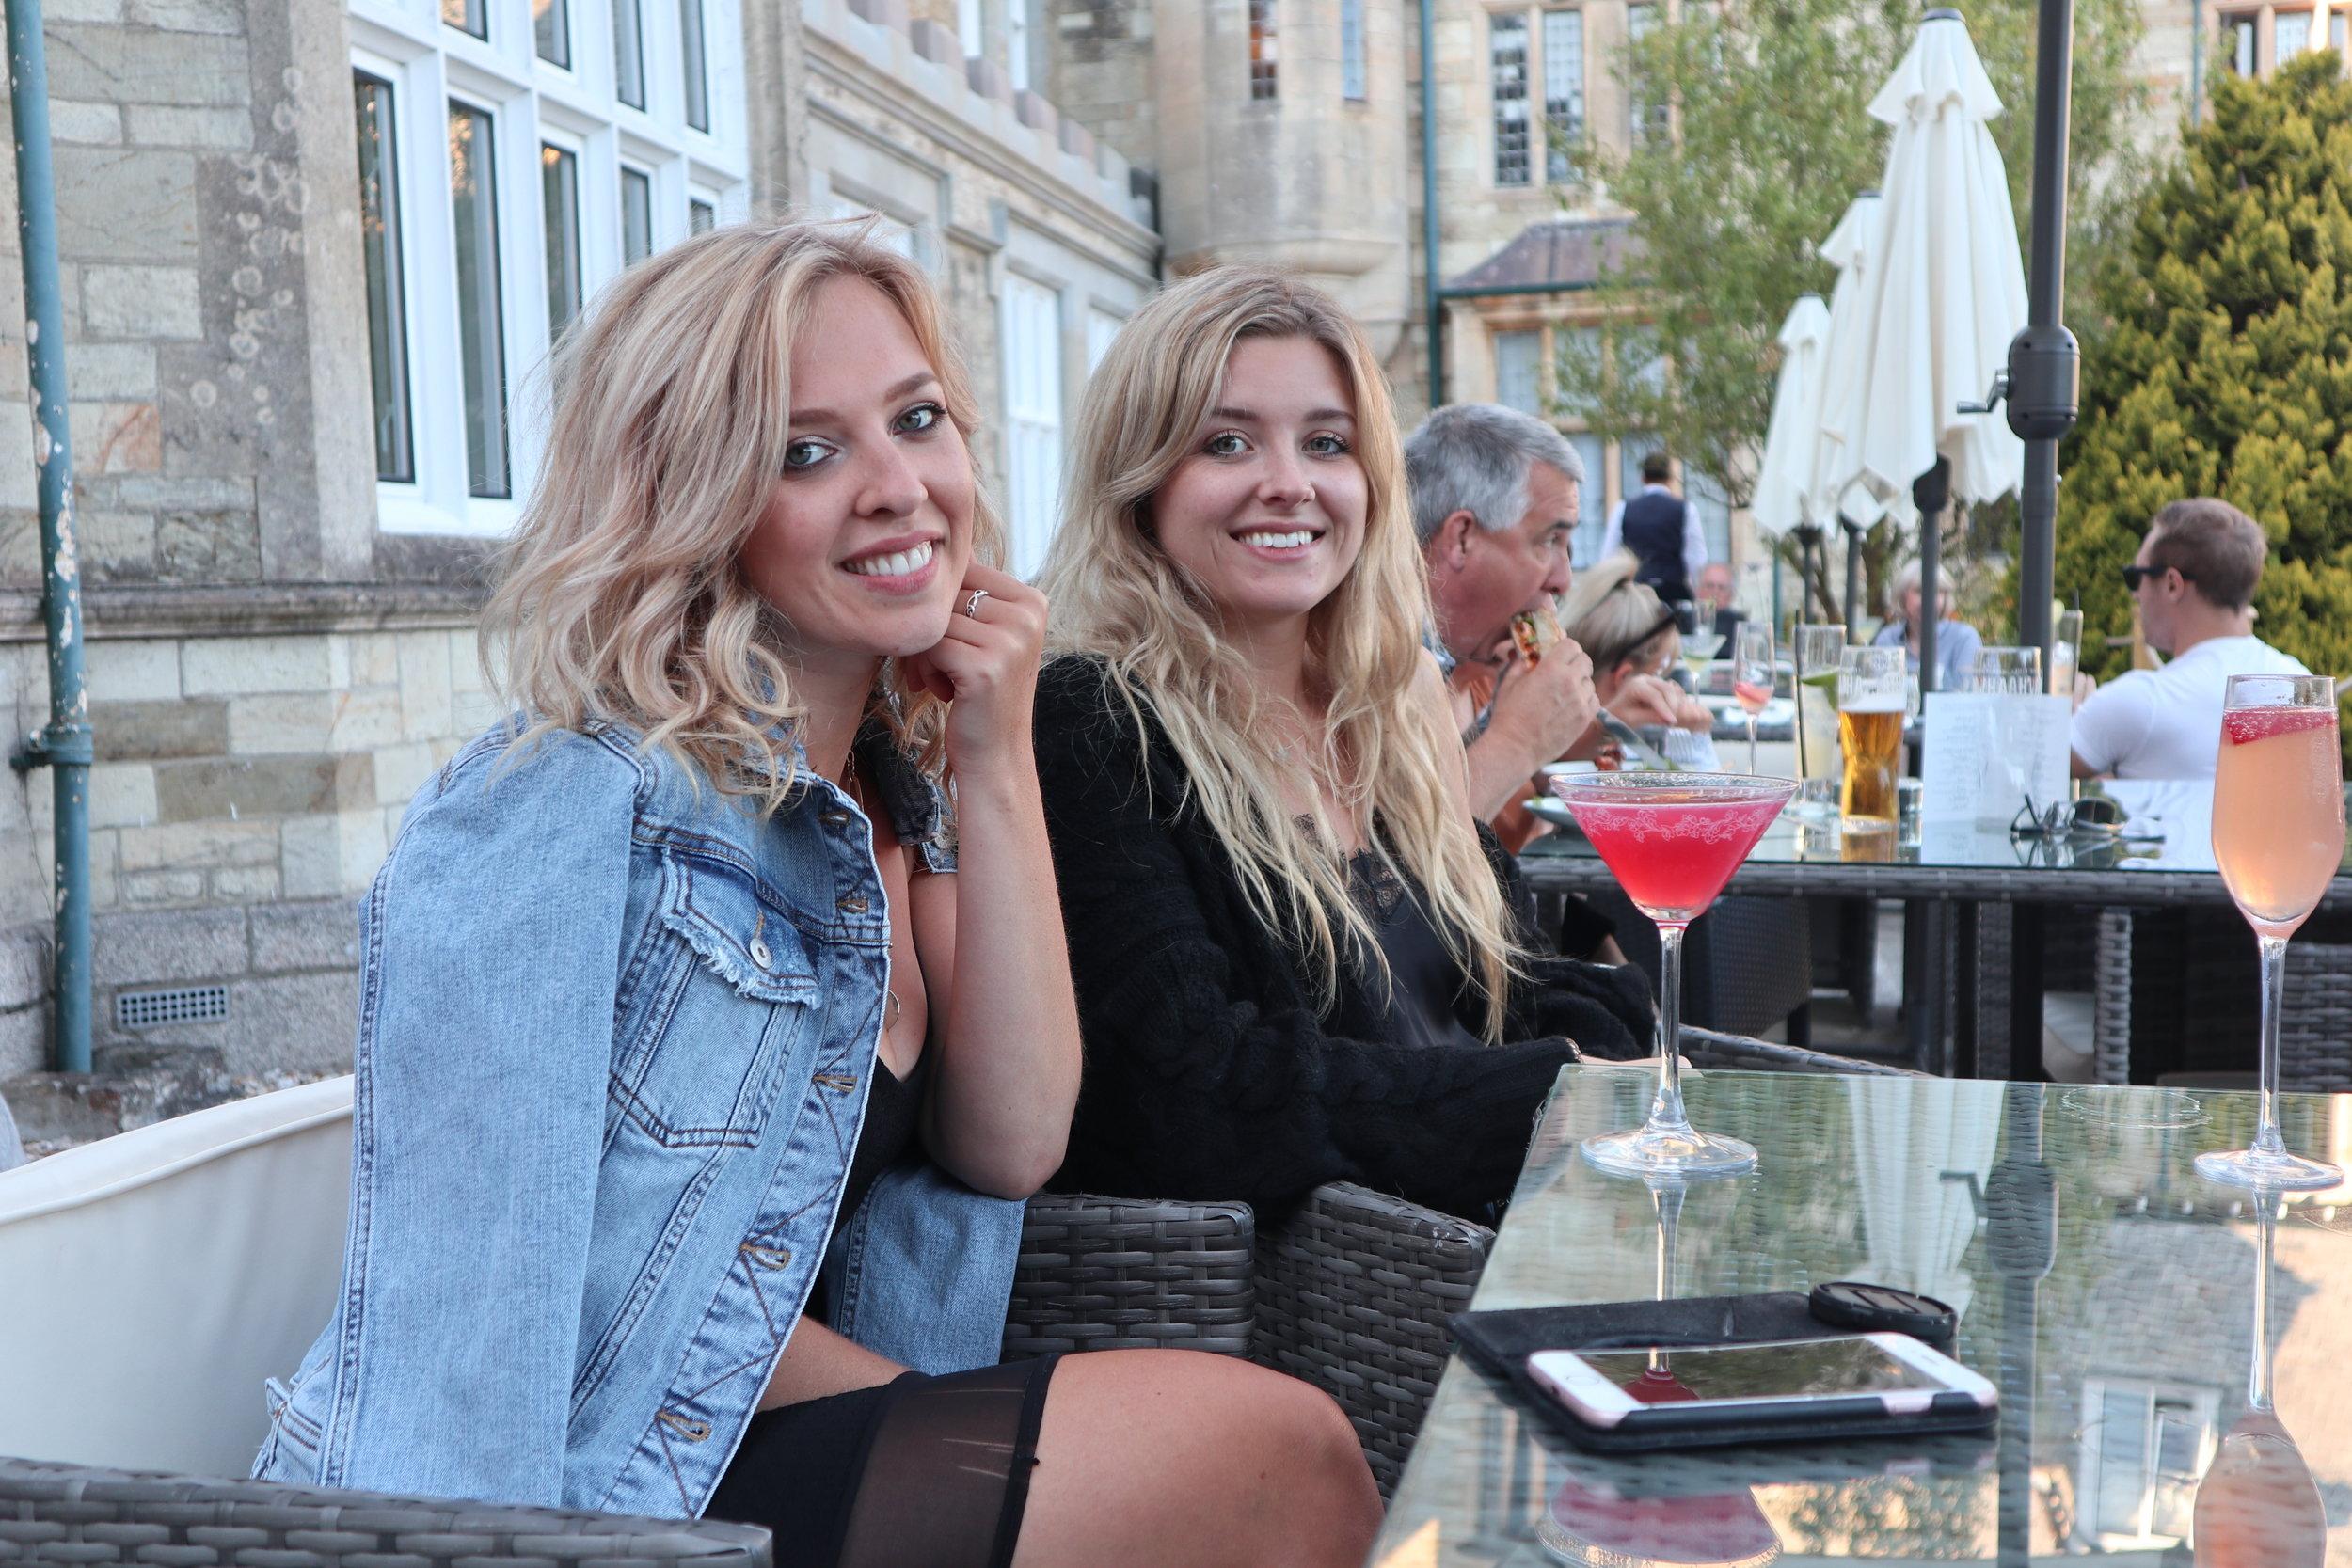 Anna and Frankie - Cornish Lifestyle Bloggers